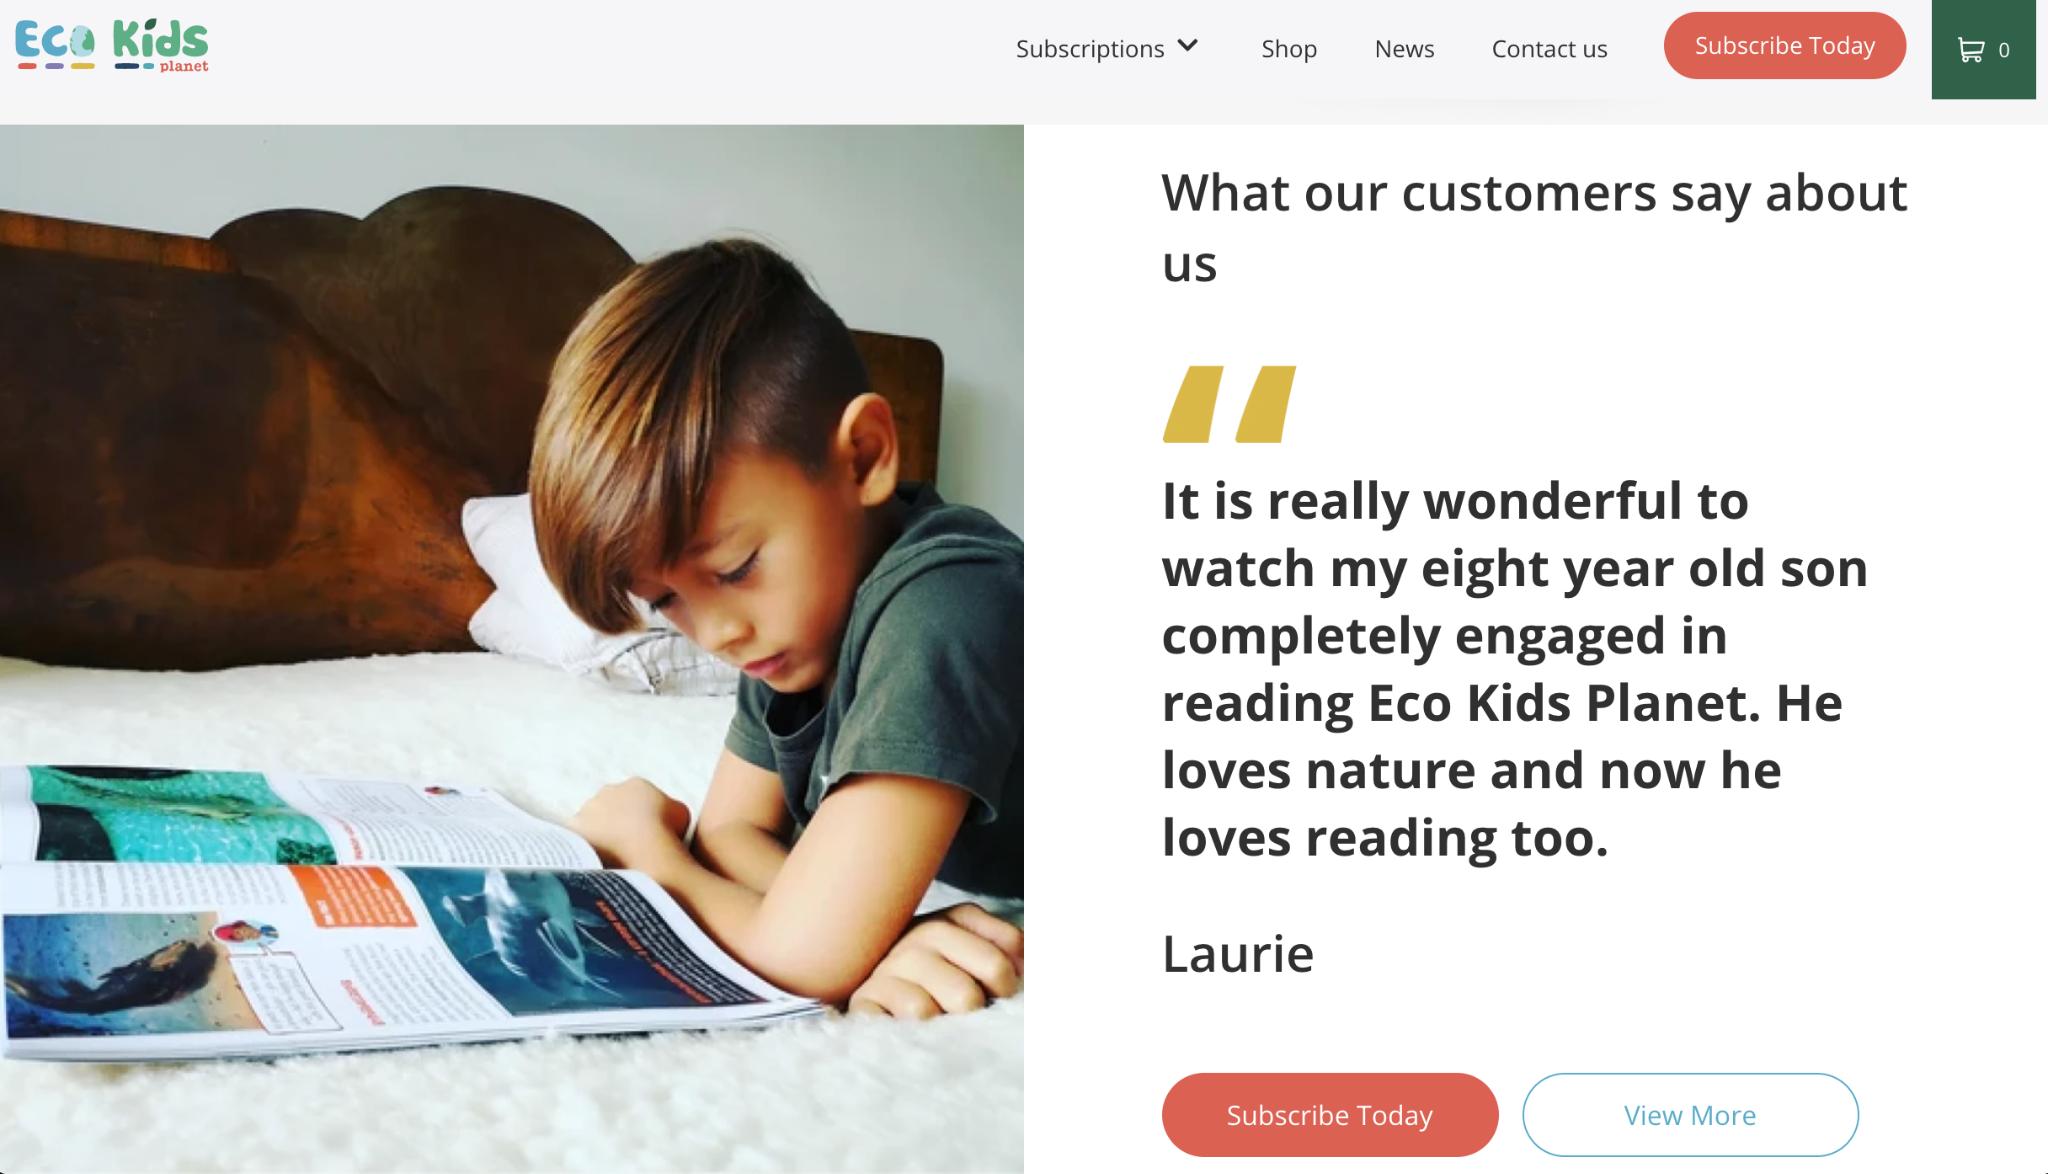 Eco Kids Planet Customer Testimonial